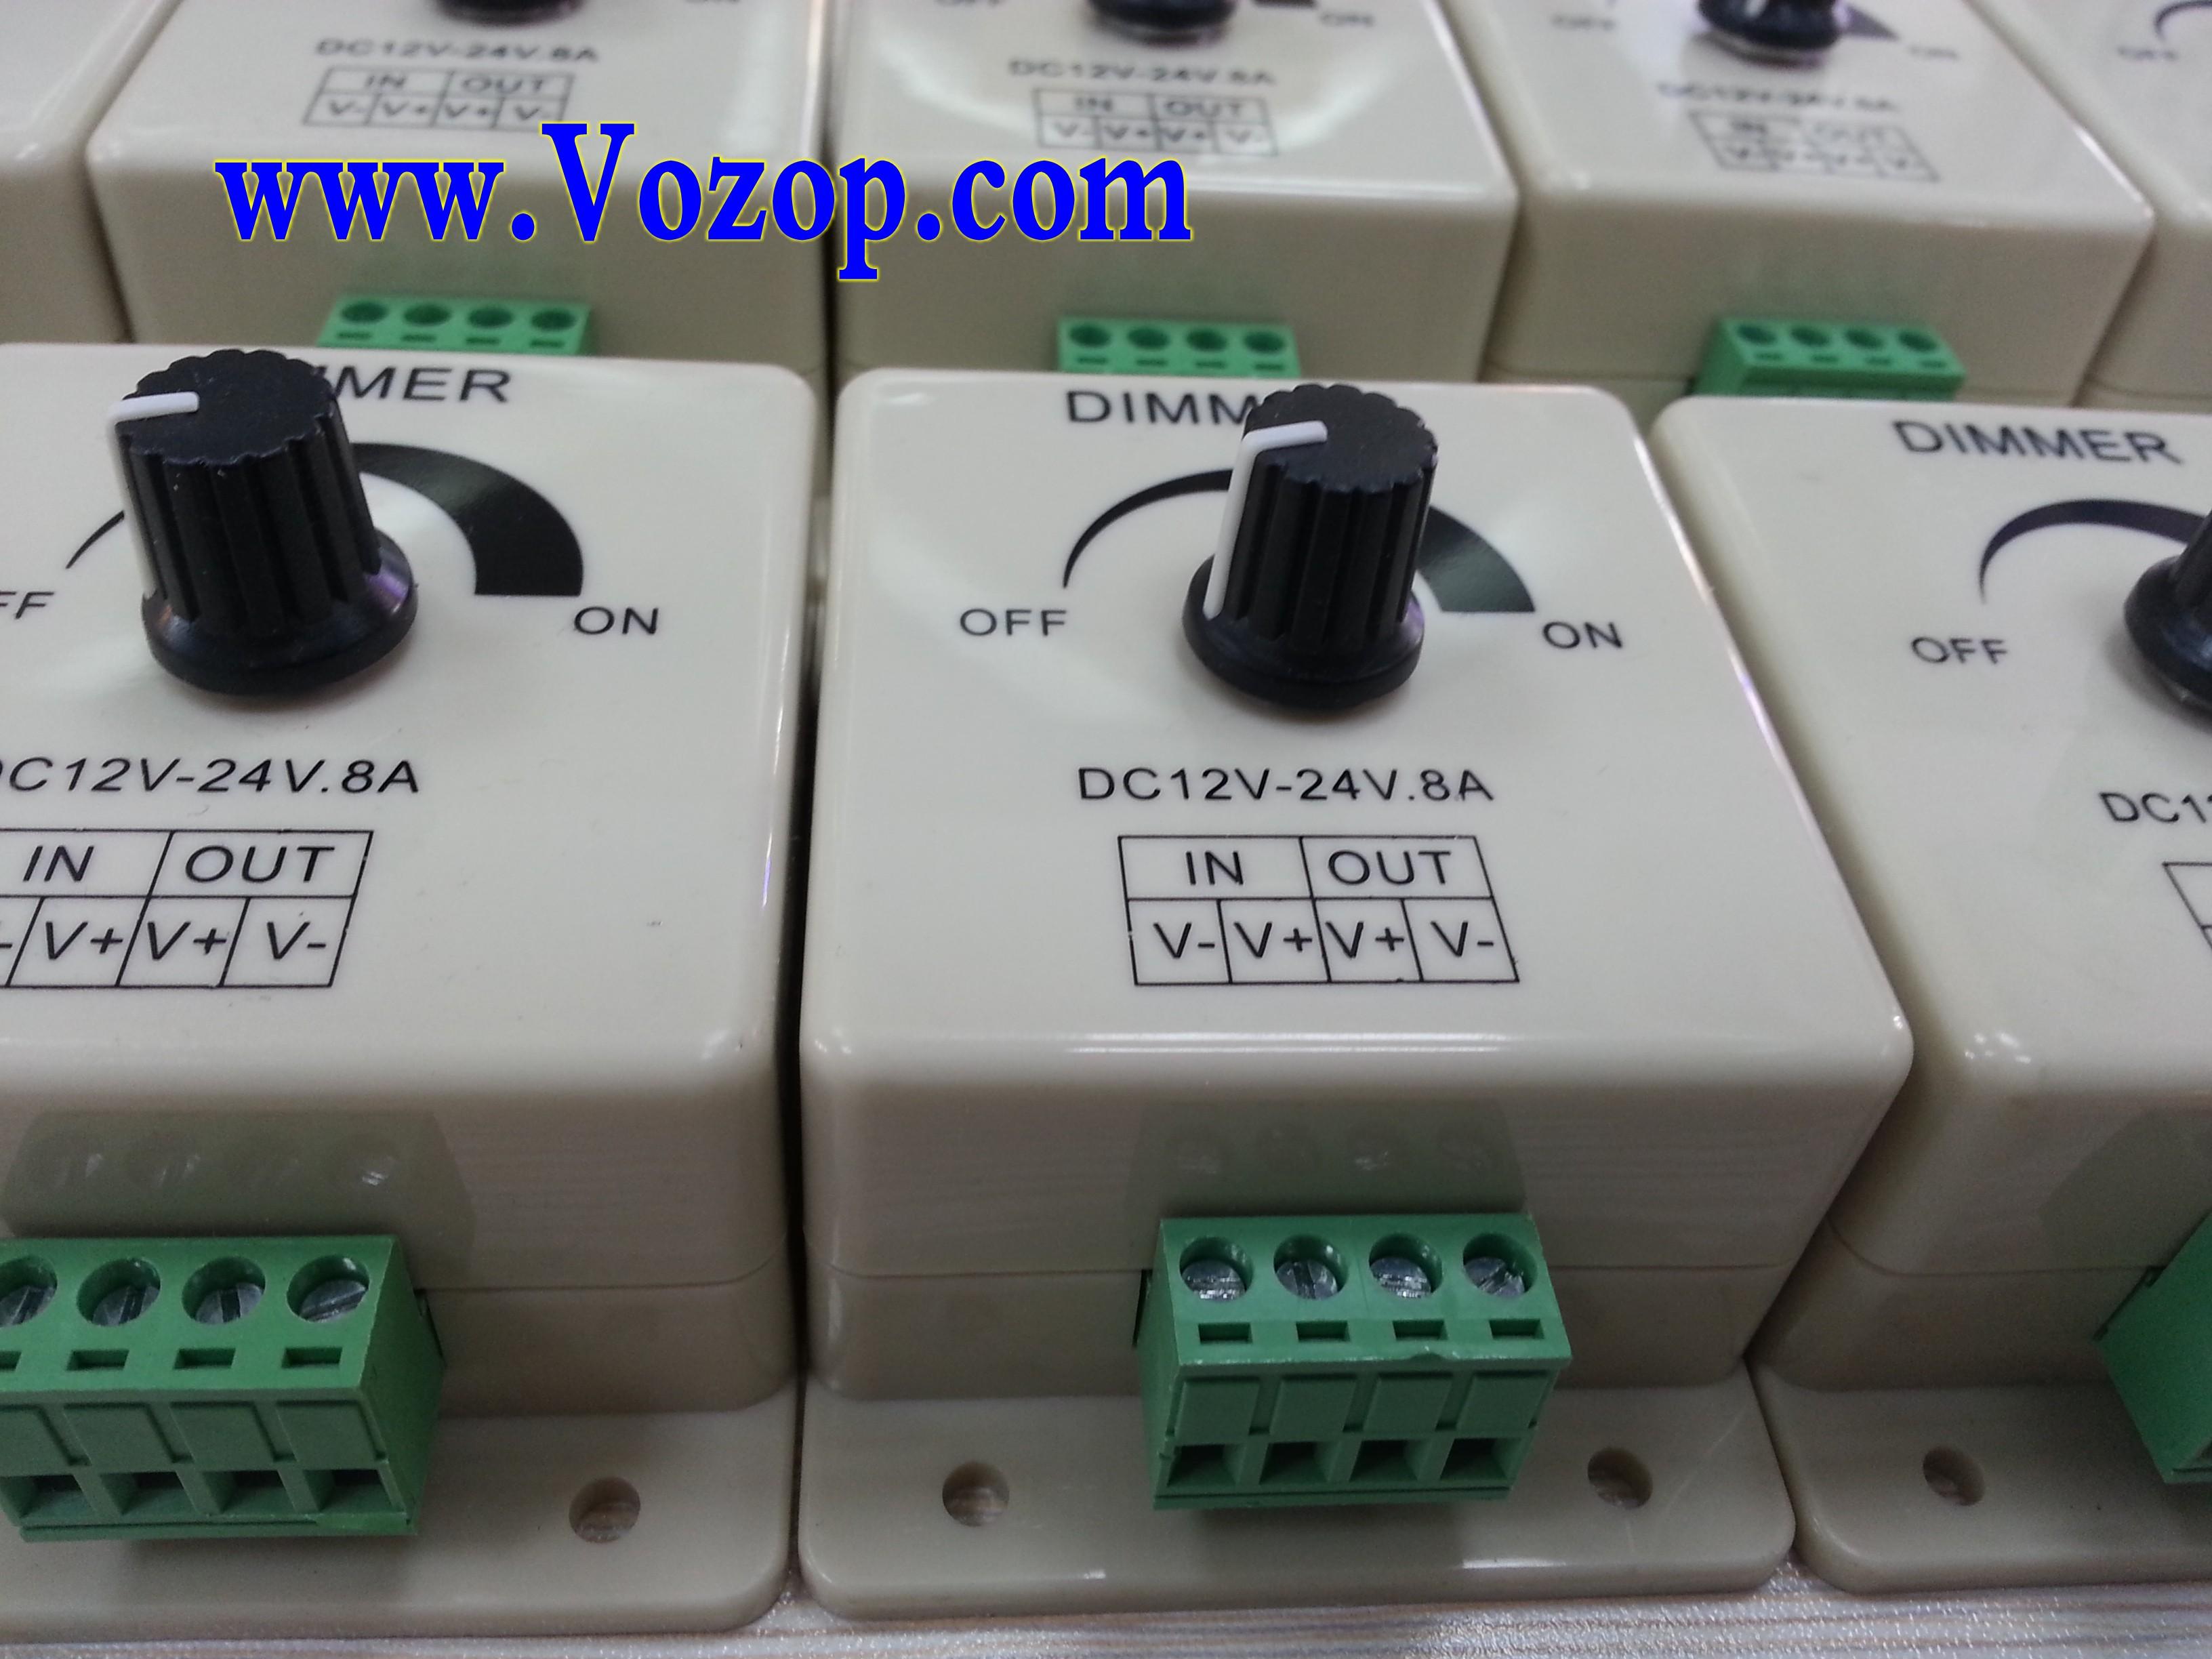 led_dimming_control_dimmer_for_led_Light